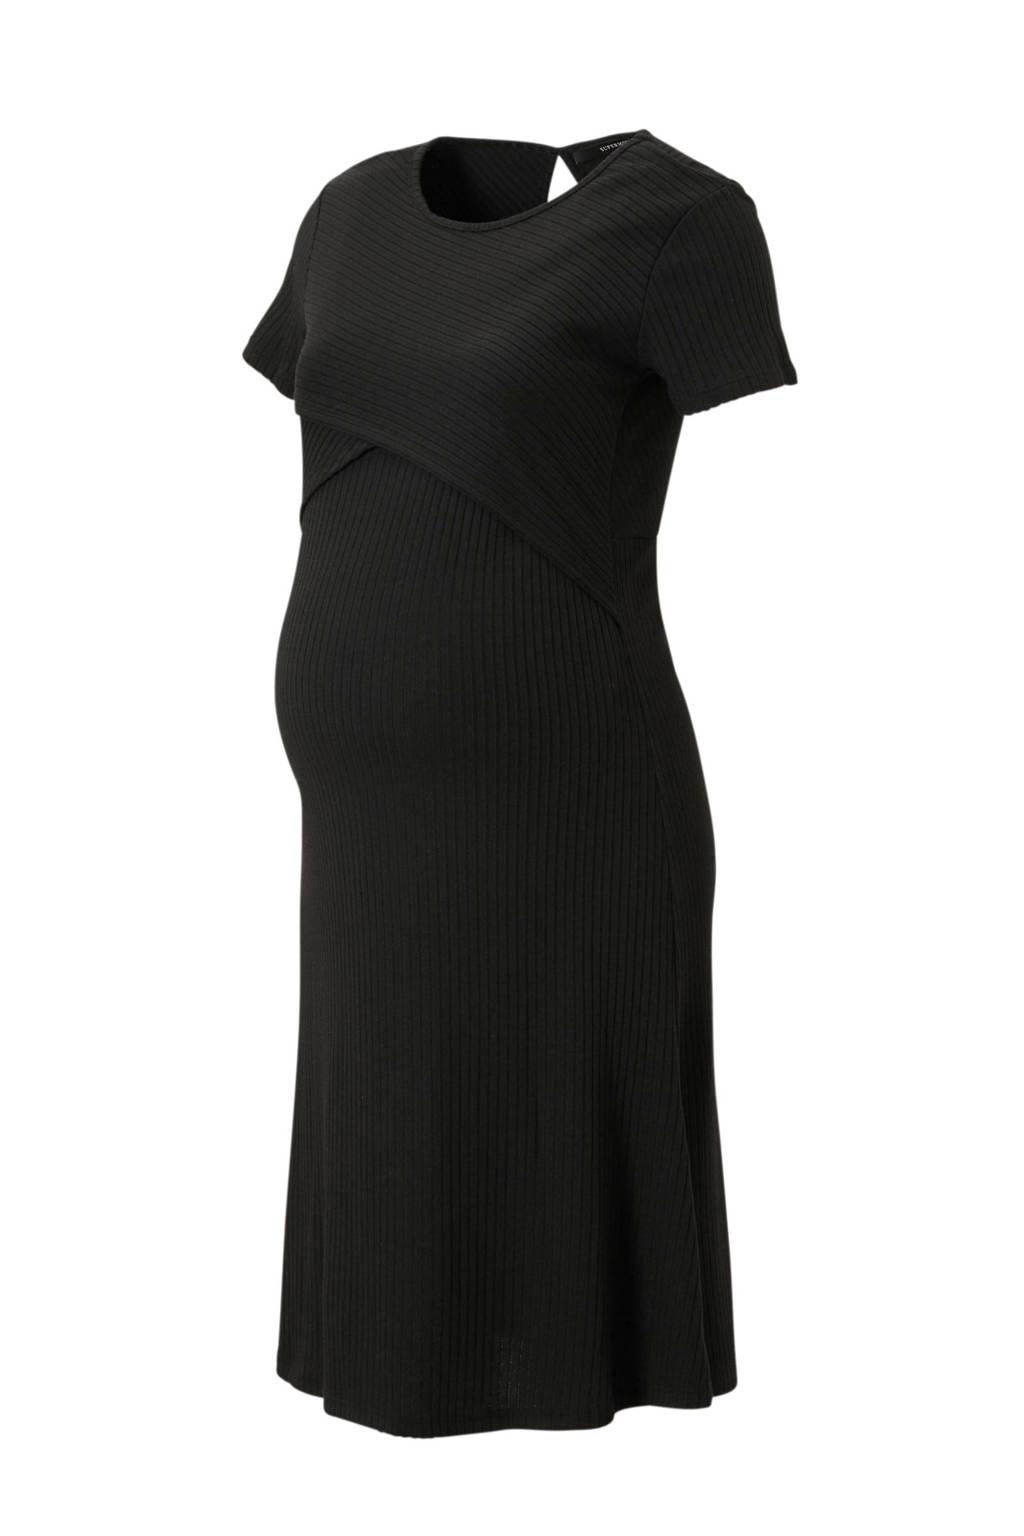 Supermom zwangerschap + voeding jurk zwart, Zwart